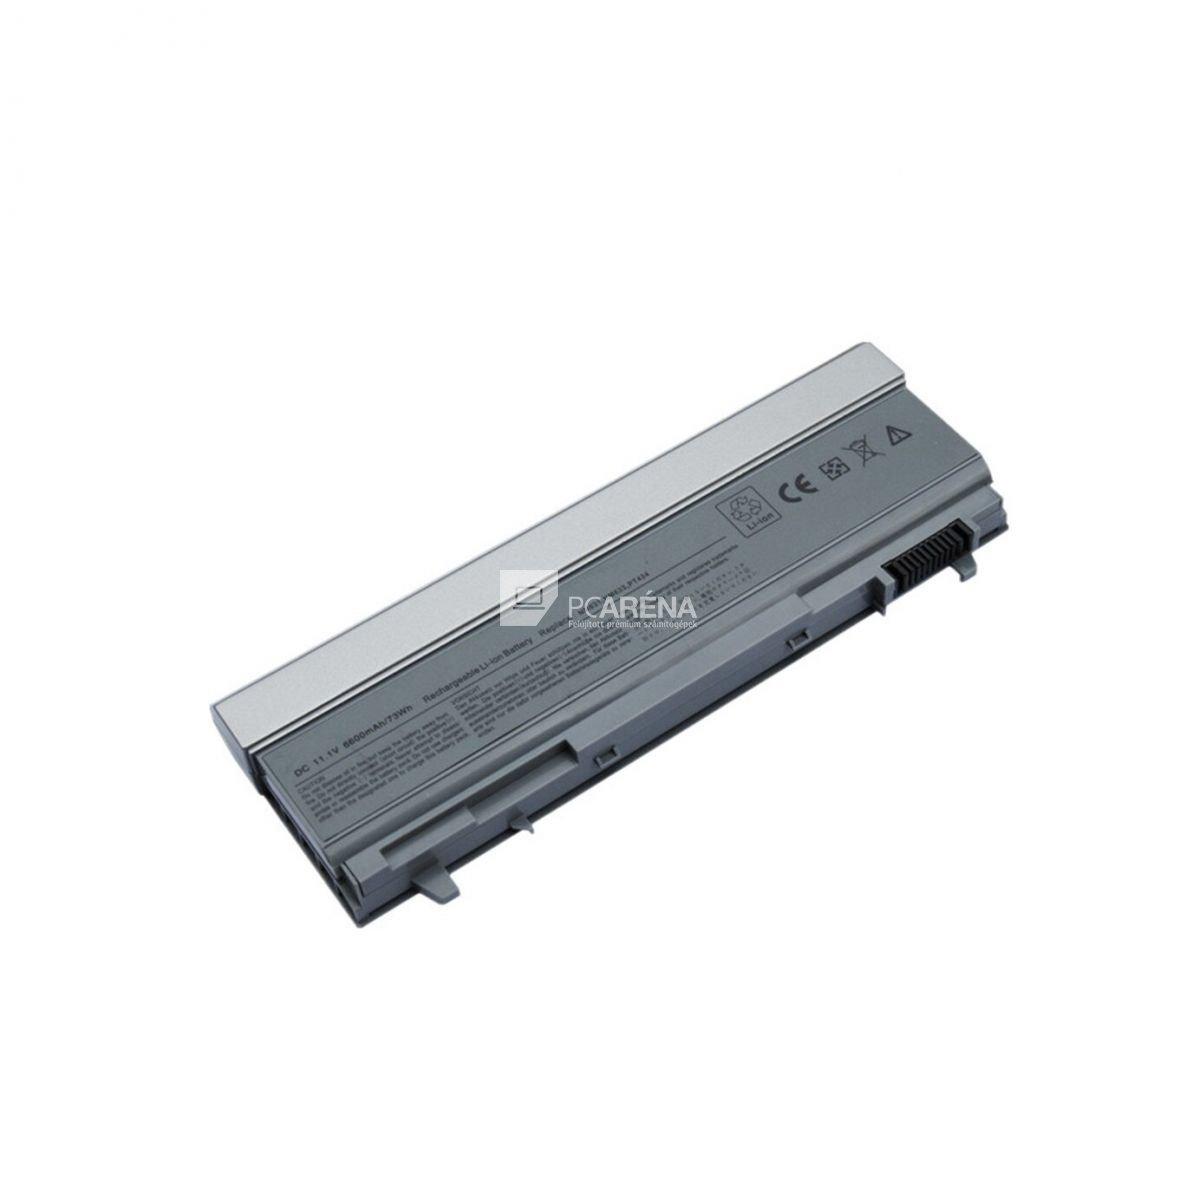 Dell E6400 - Li-ion - 11.1 V